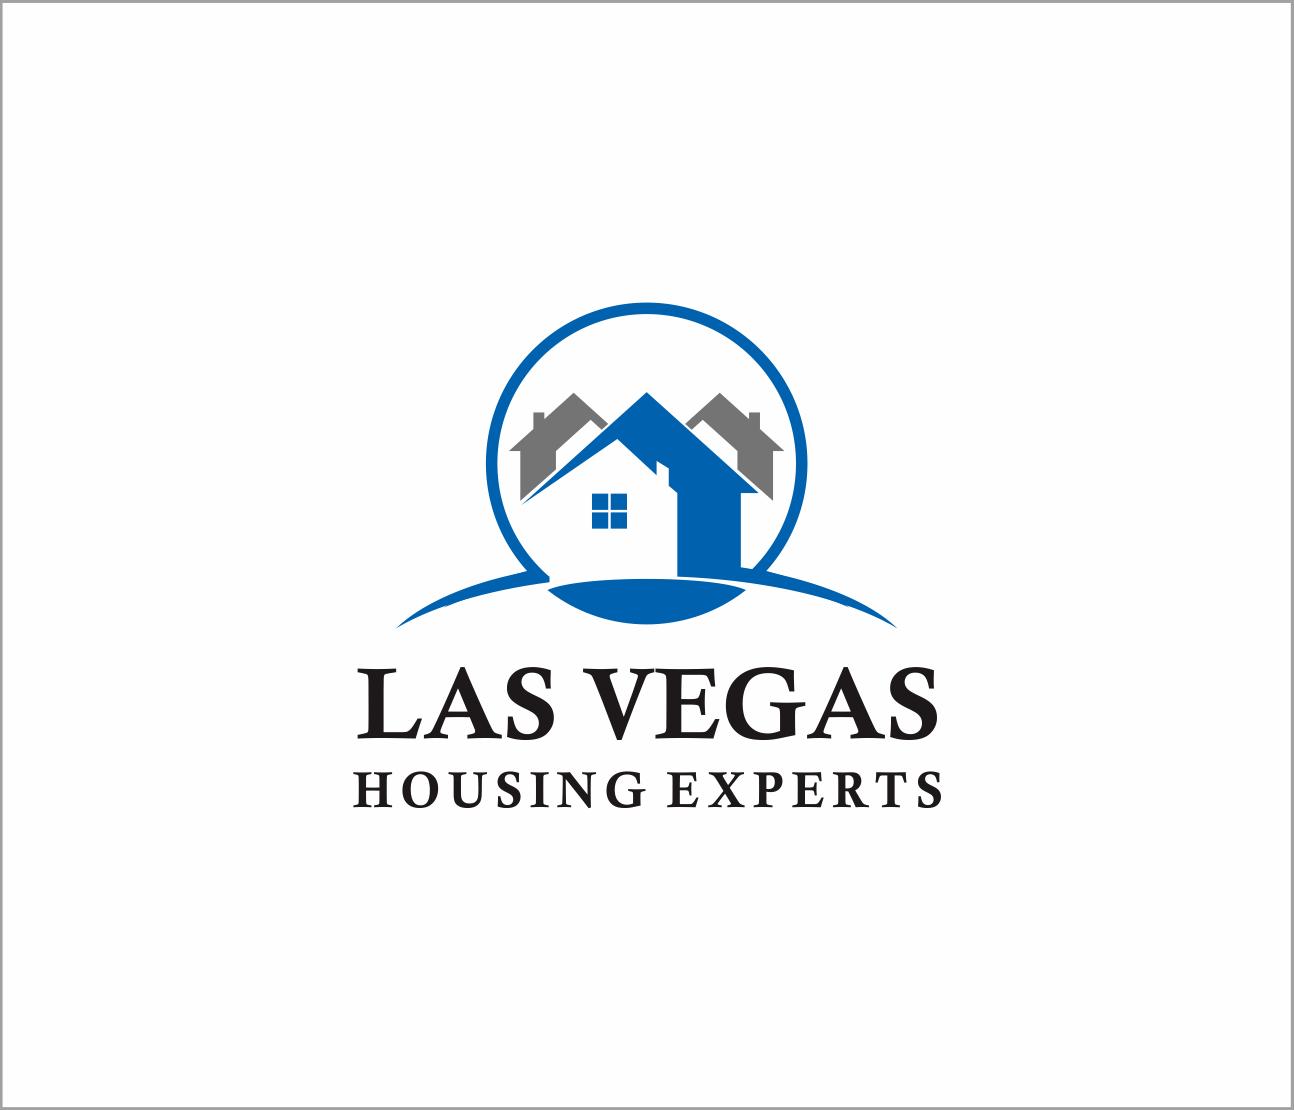 Logo Design by Armada Jamaluddin - Entry No. 122 in the Logo Design Contest Las Vegas Housing Experts Logo Design.